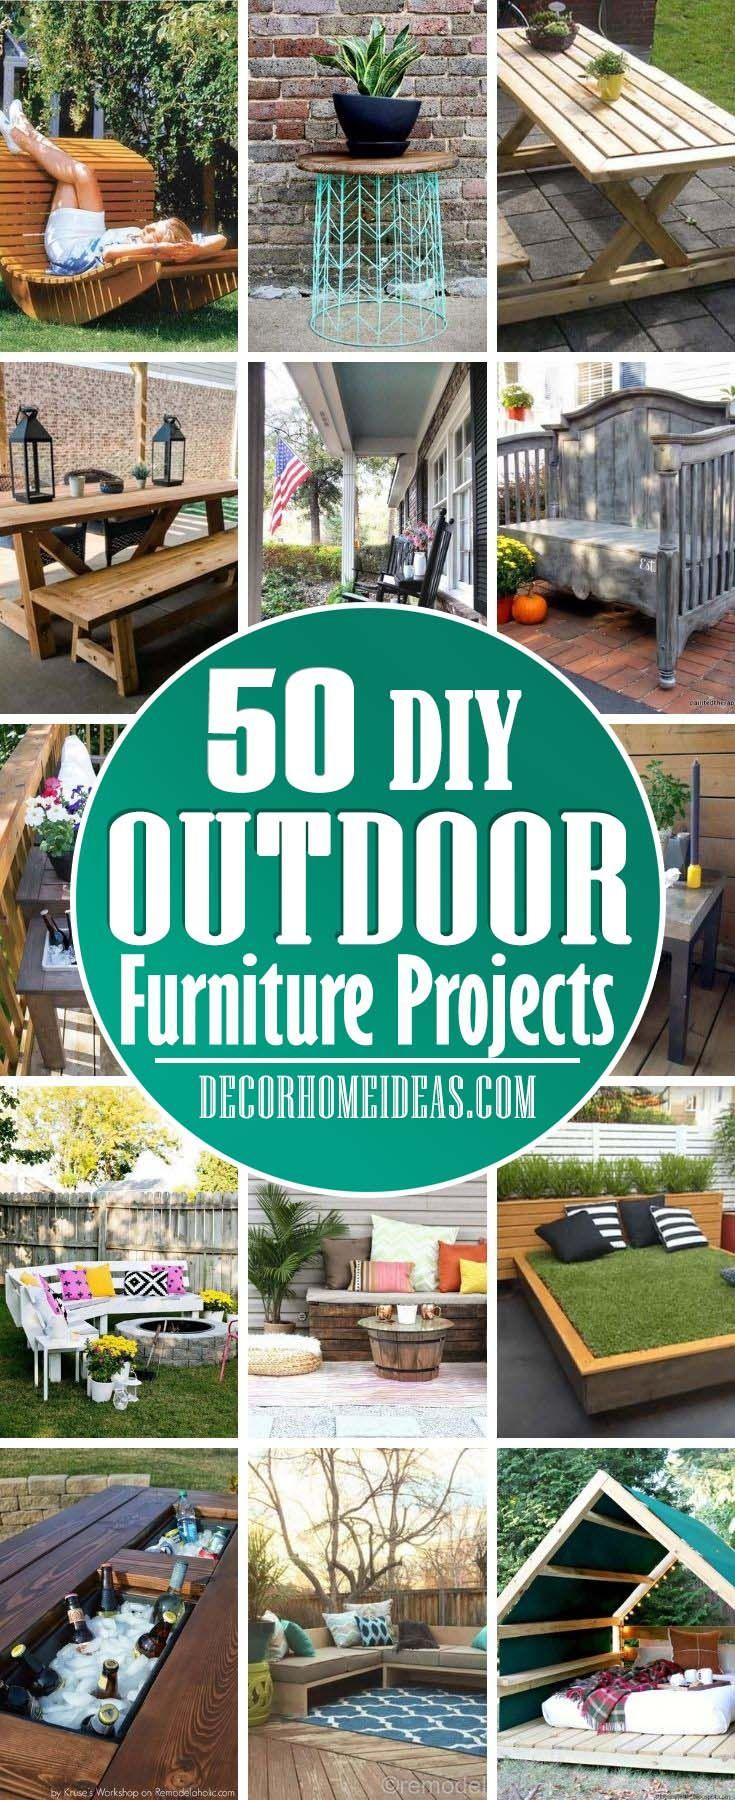 28 Beautiful Corner Garden Ideas And Designs Diy Outdoor Furniture Diy Garden Decor Diy Outdoor